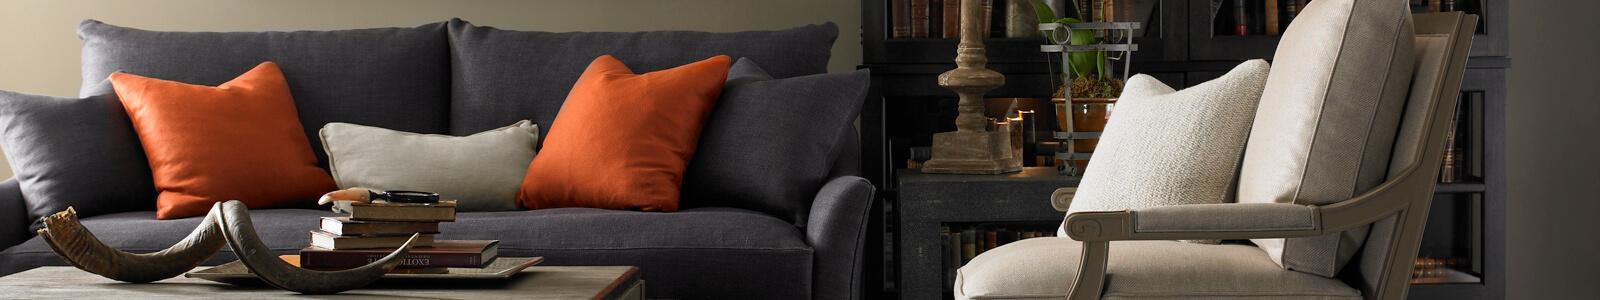 Lillian August Furniture Banner